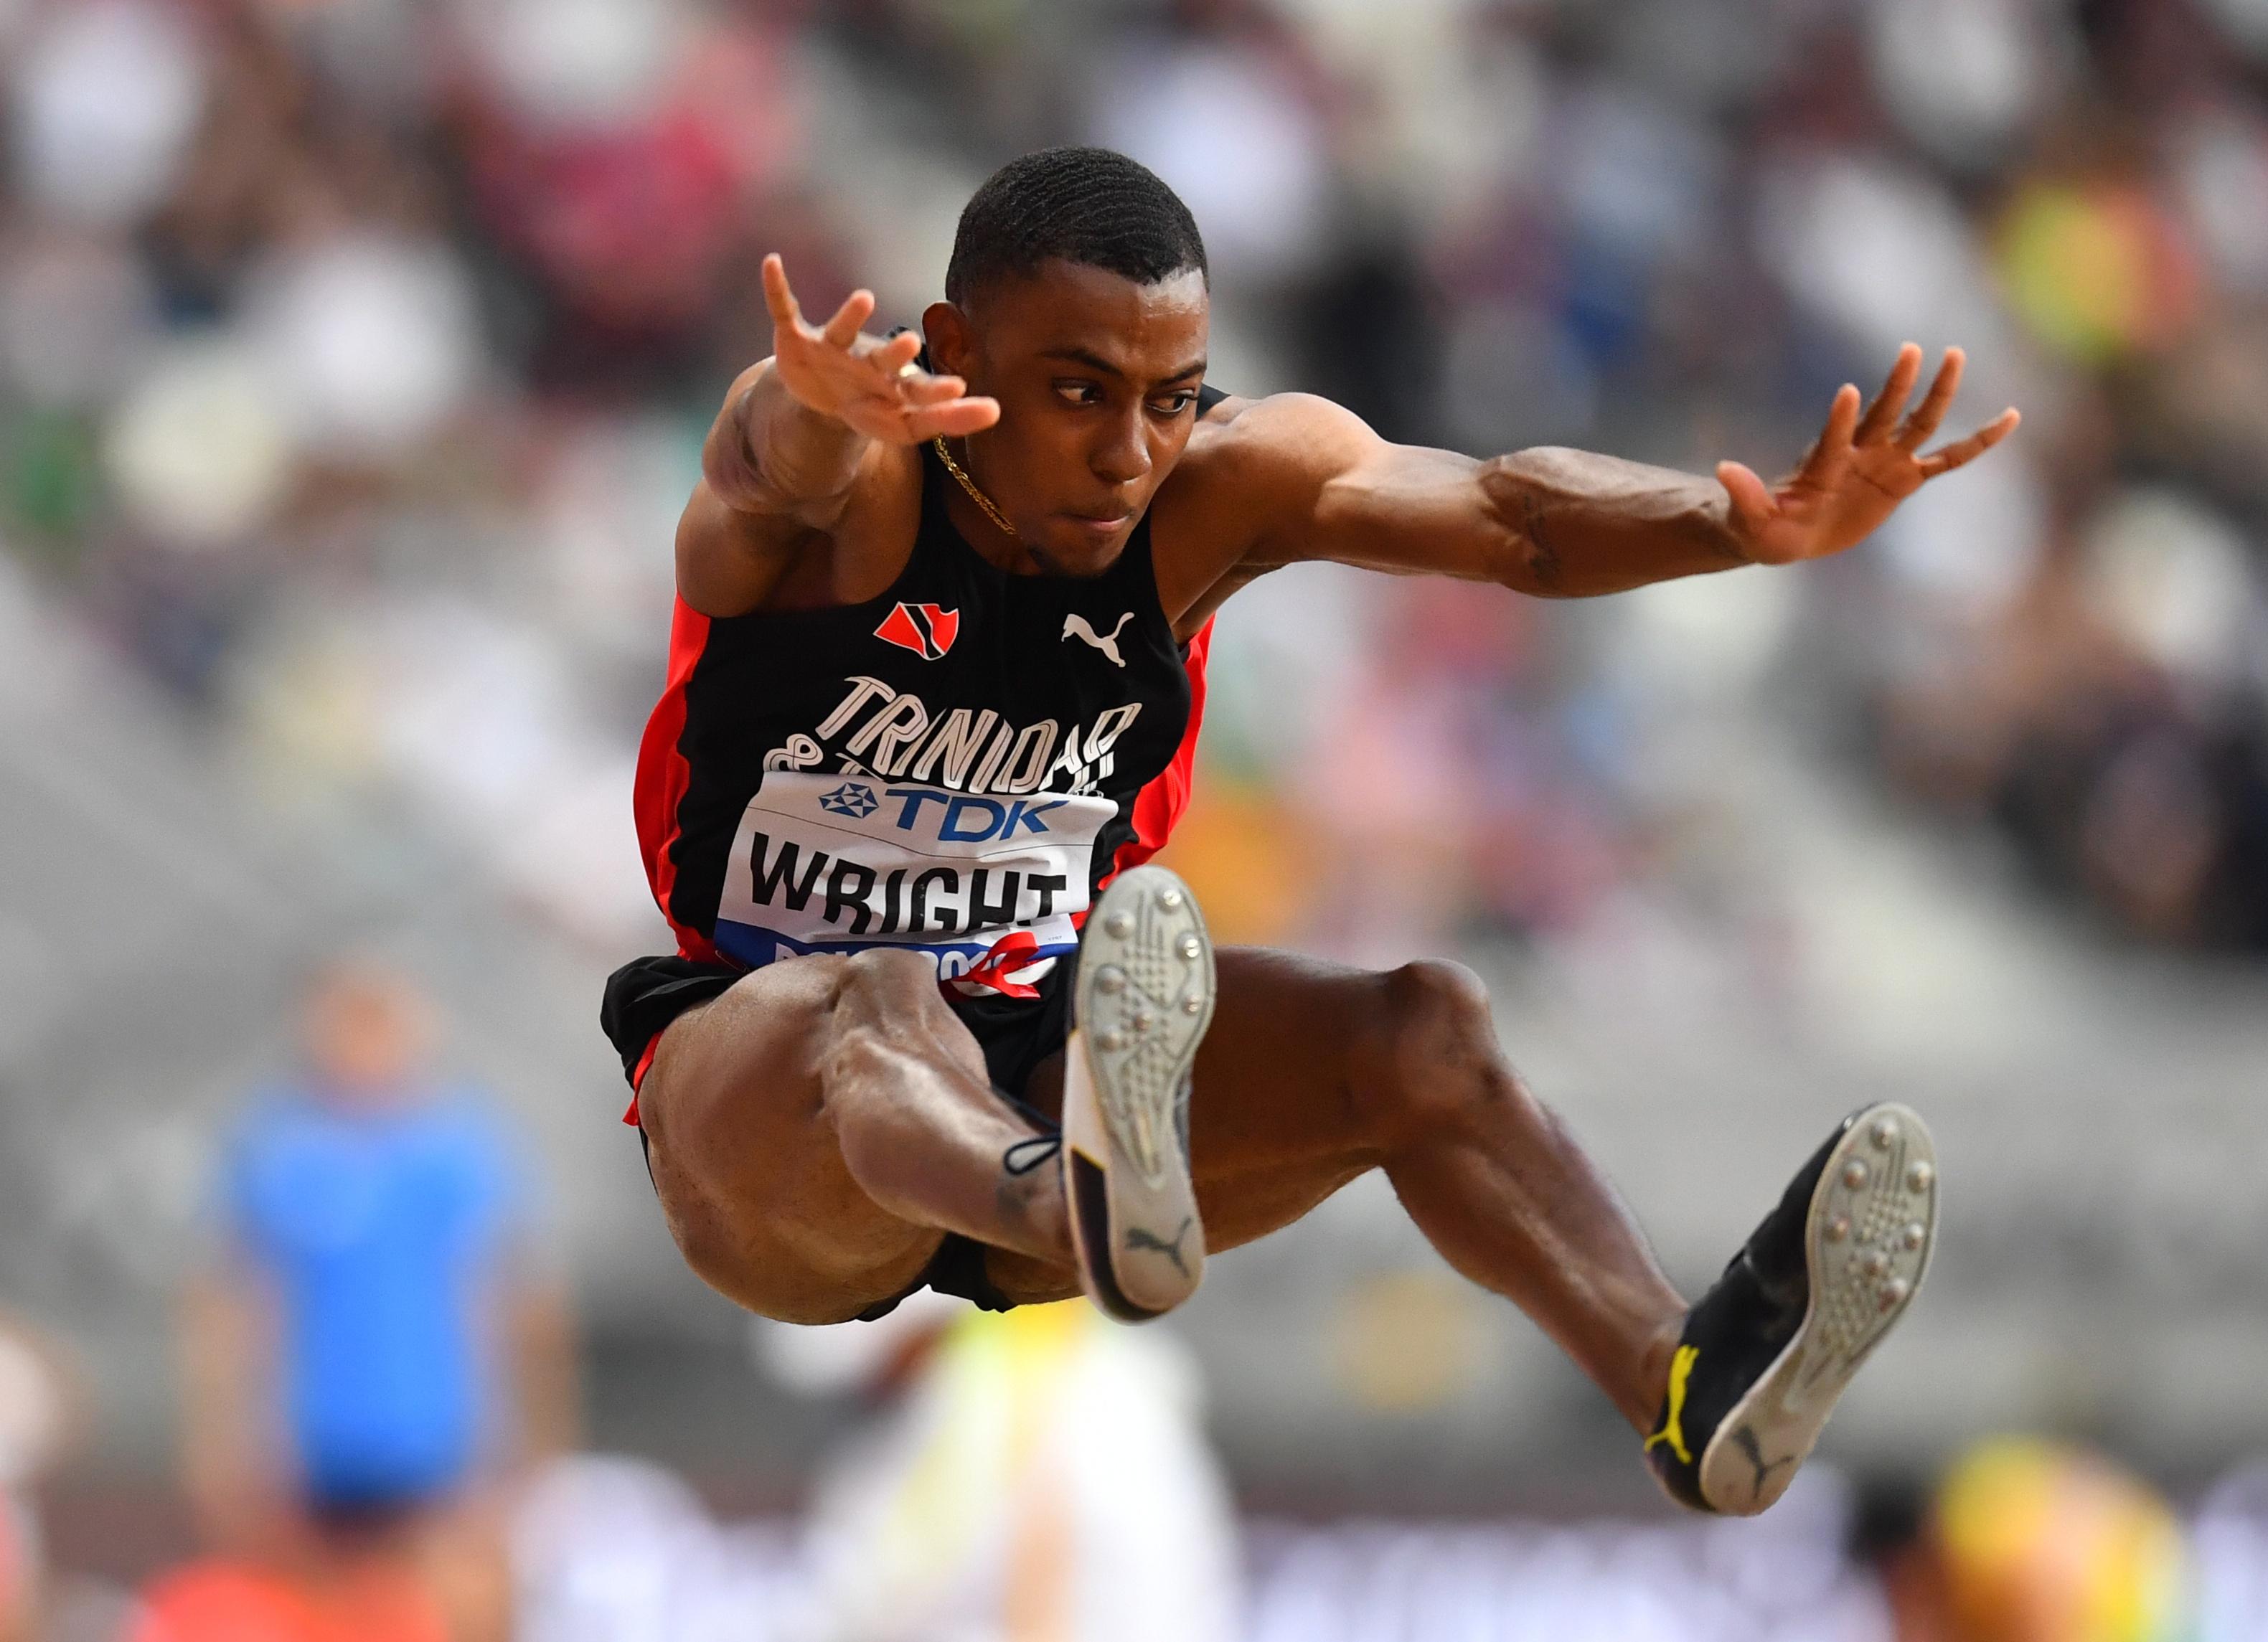 Athletics - World Athletics Championships - Doha 2019 - Men's Long Jump Qualification - Khalifa International Stadium, Doha, Qatar - September 27, 2019  Trinidad and Tobago's Andwuelle Wright in action REUTERS/Dylan Martinez